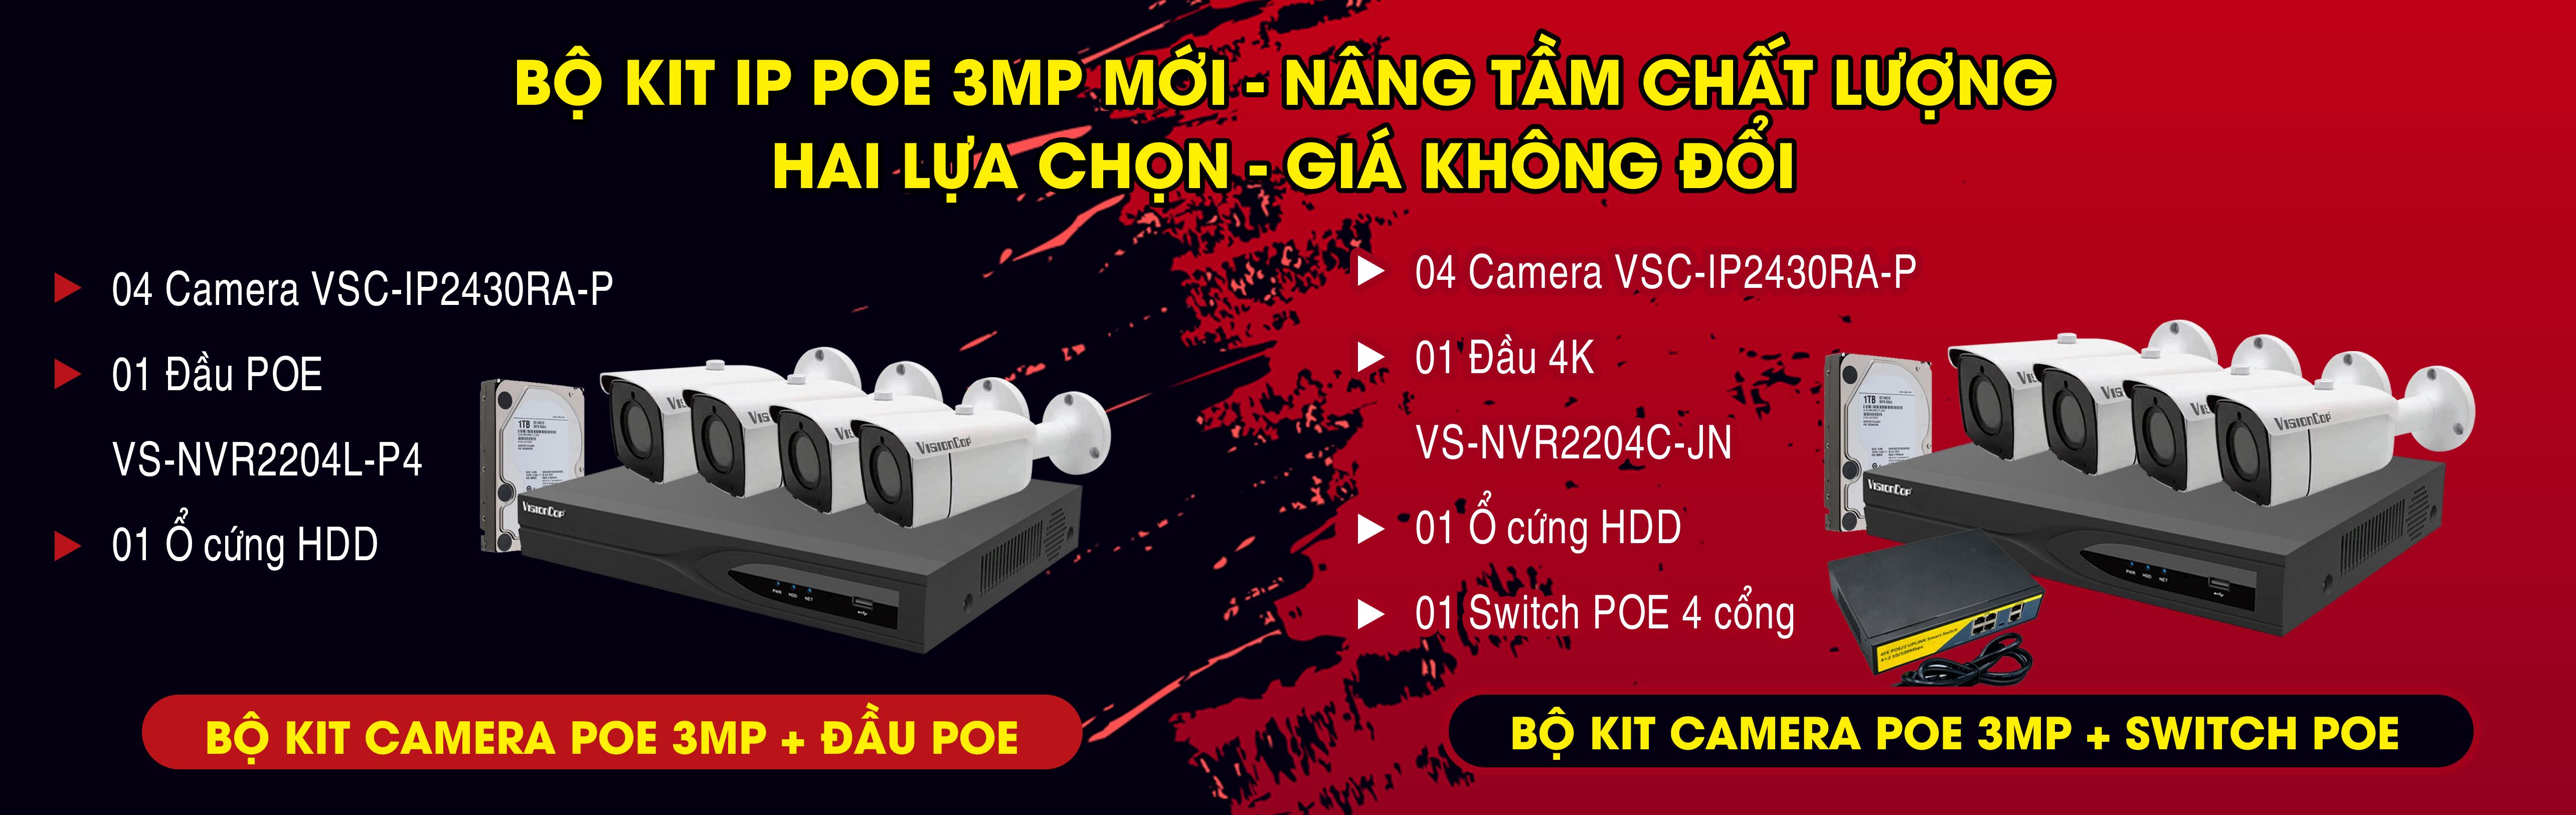 http://visioncop.com/gioi-thieu-bo-kit-ip-poe-3mp-moi-thuong-hieu-visioncop